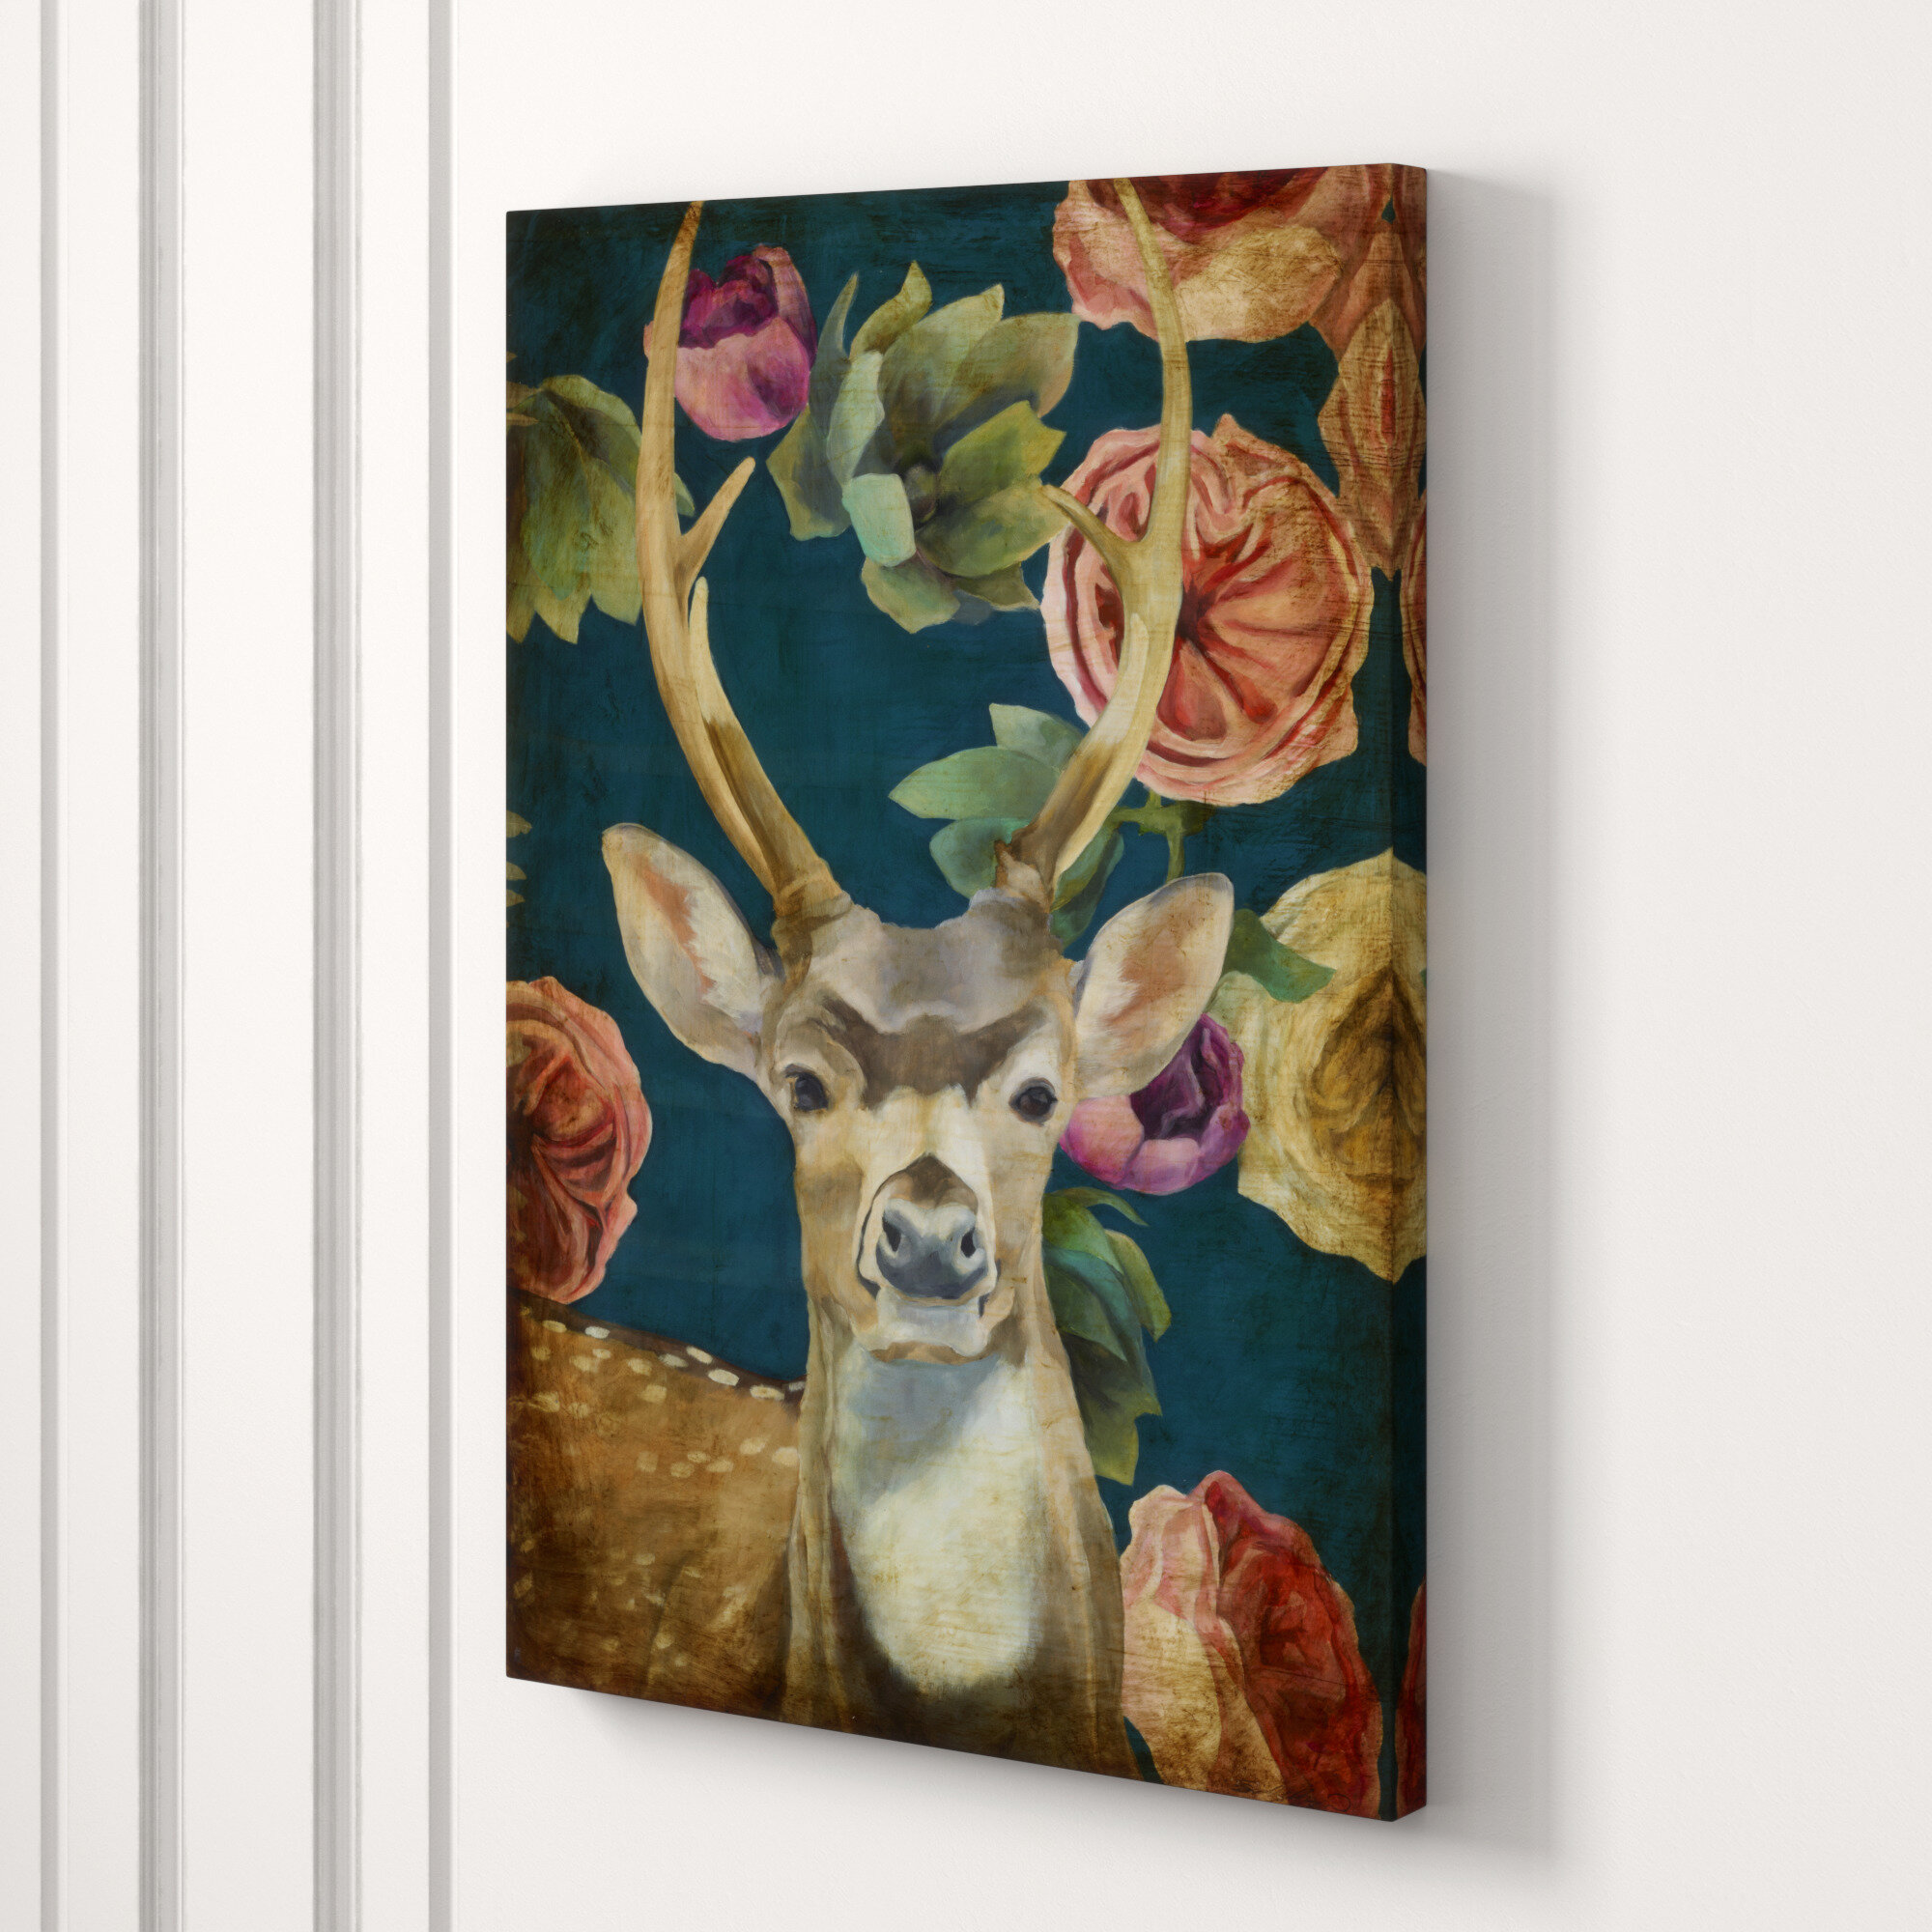 Chelsea Art Studio Wild Bouquet Iv By Sarah Atkinson Wrapped Canvas Graphic Art Print Perigold